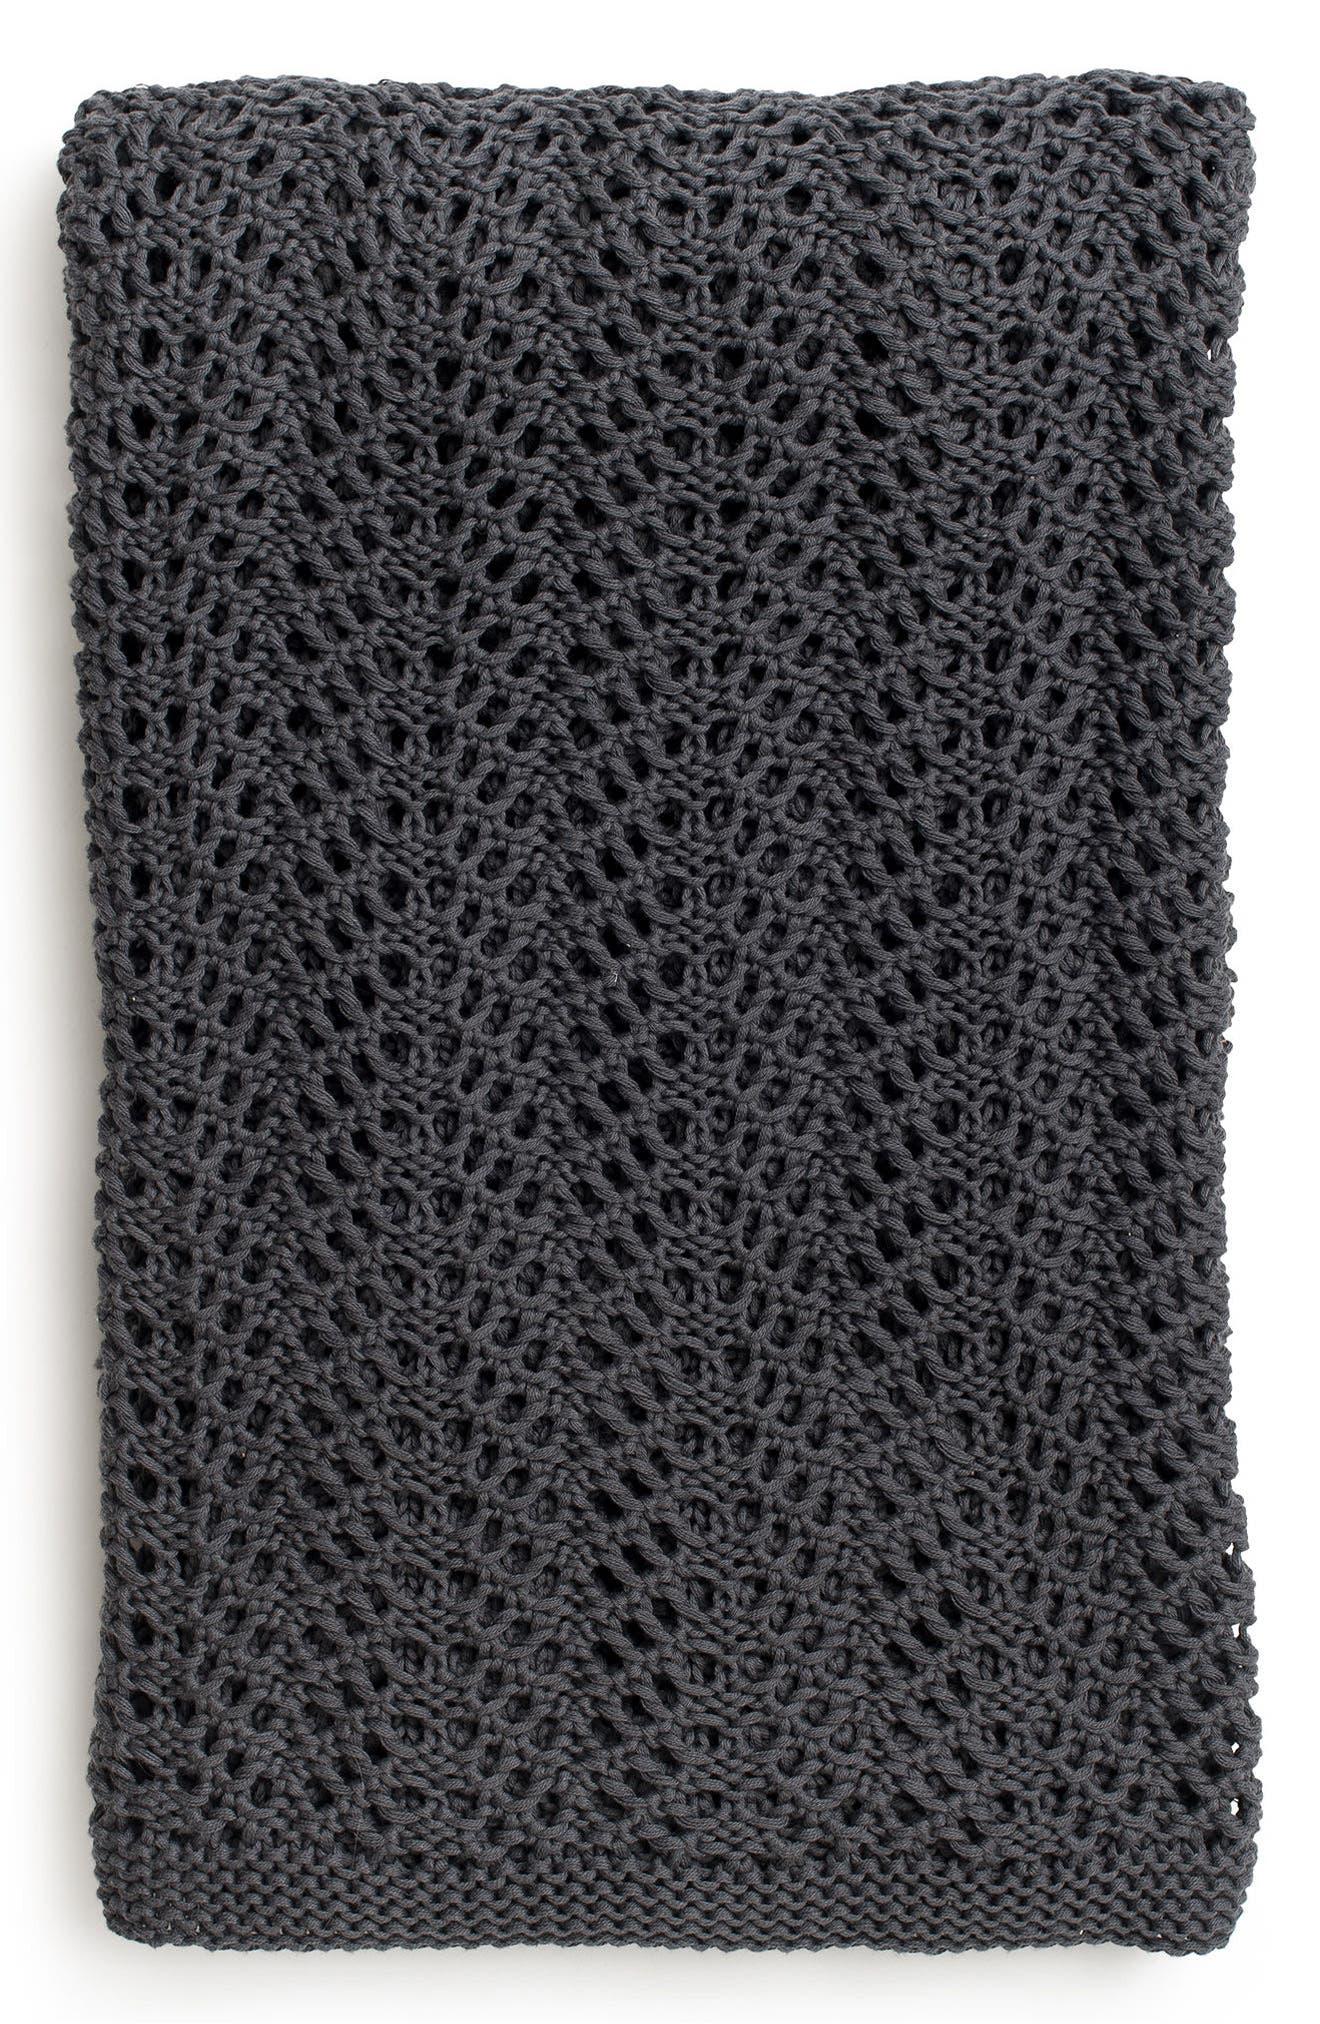 Organic Cotton Boho Knit Throw,                             Main thumbnail 1, color,                             010